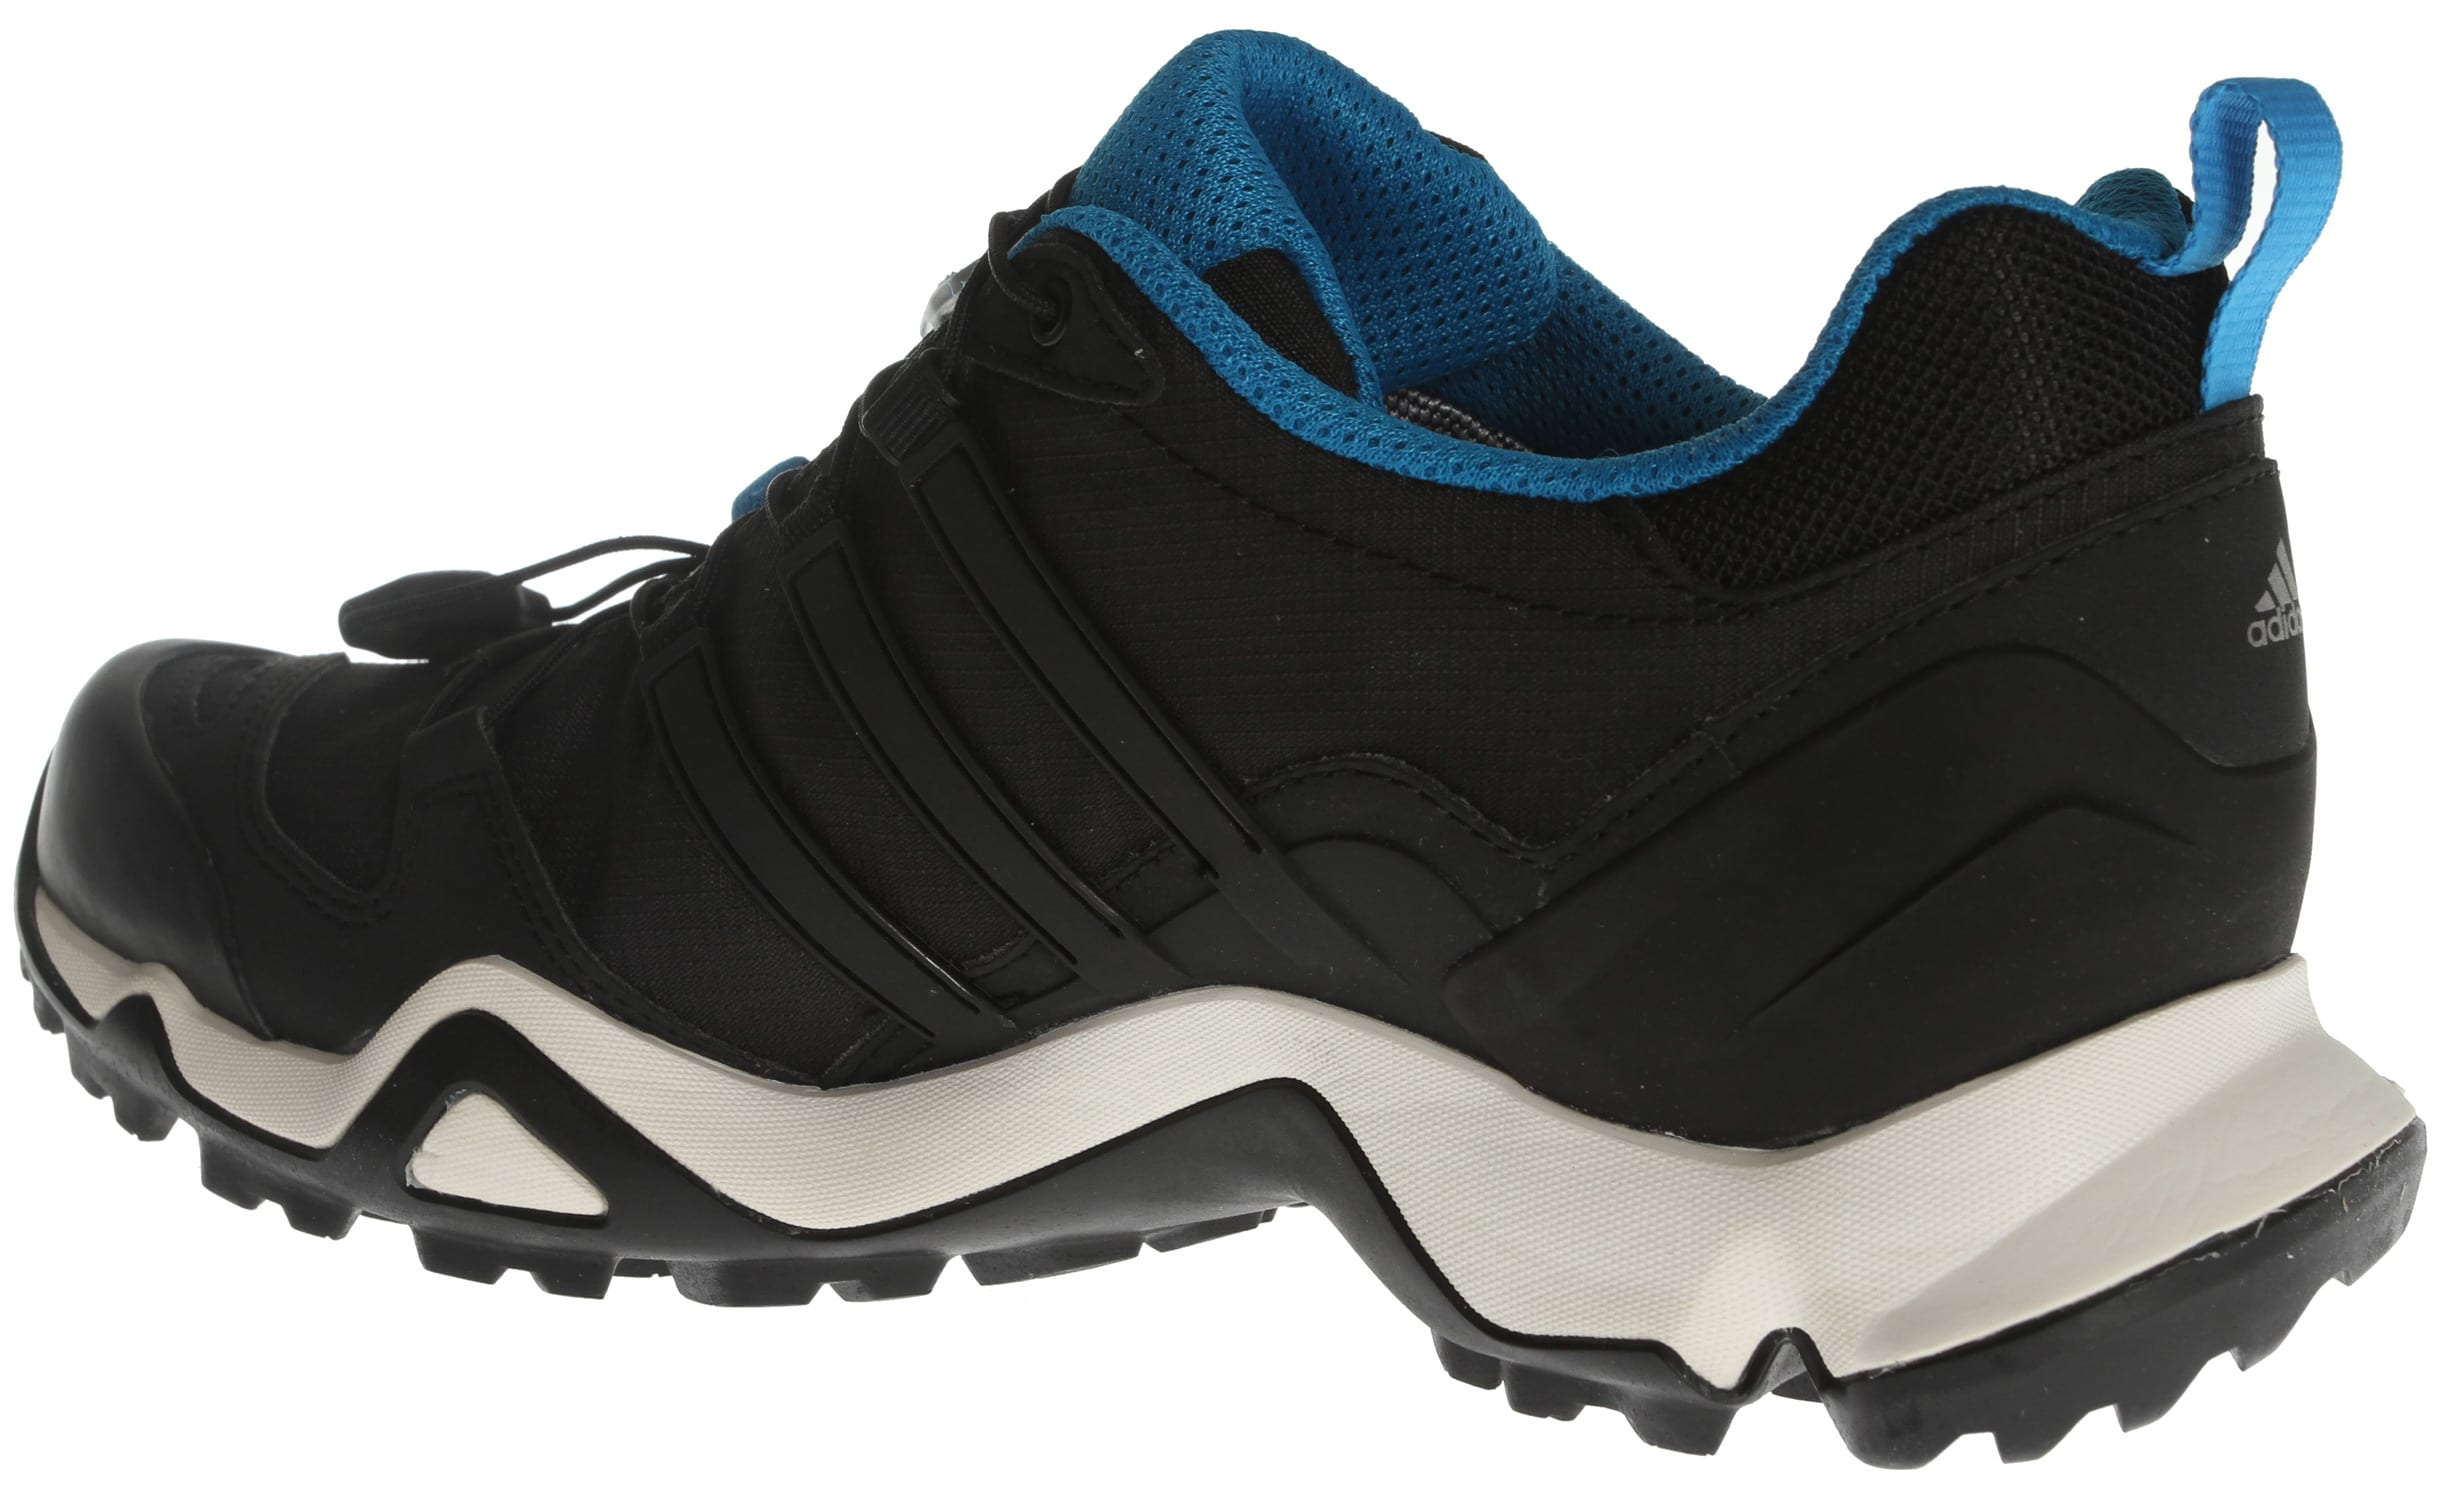 fea3defeef859 Adidas Terrex Swift R GTX Hiking Shoes - thumbnail 3